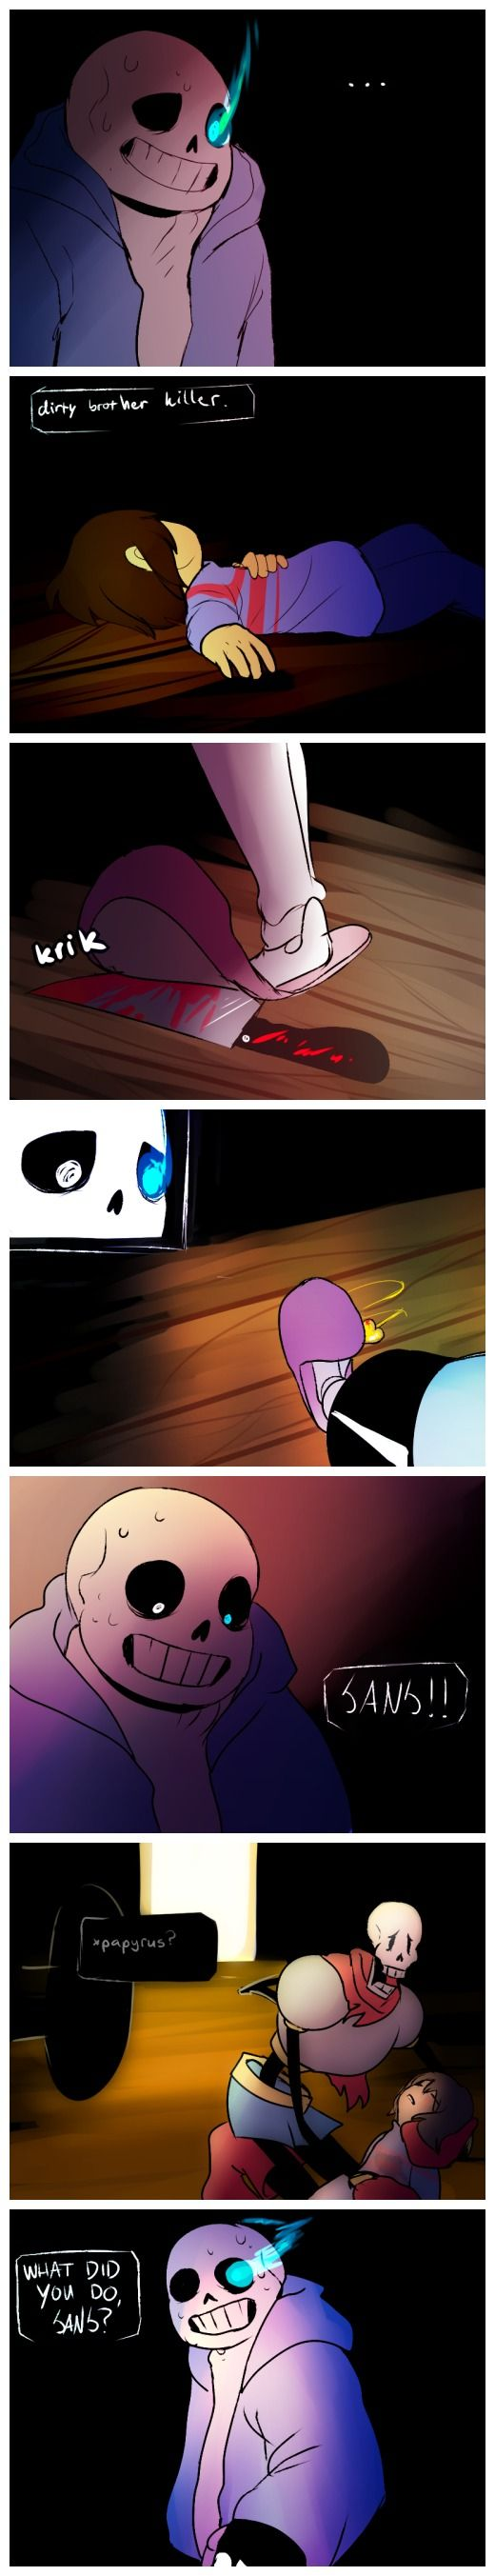 Sans, Frisk, and Papyrus #comic #blood #knife